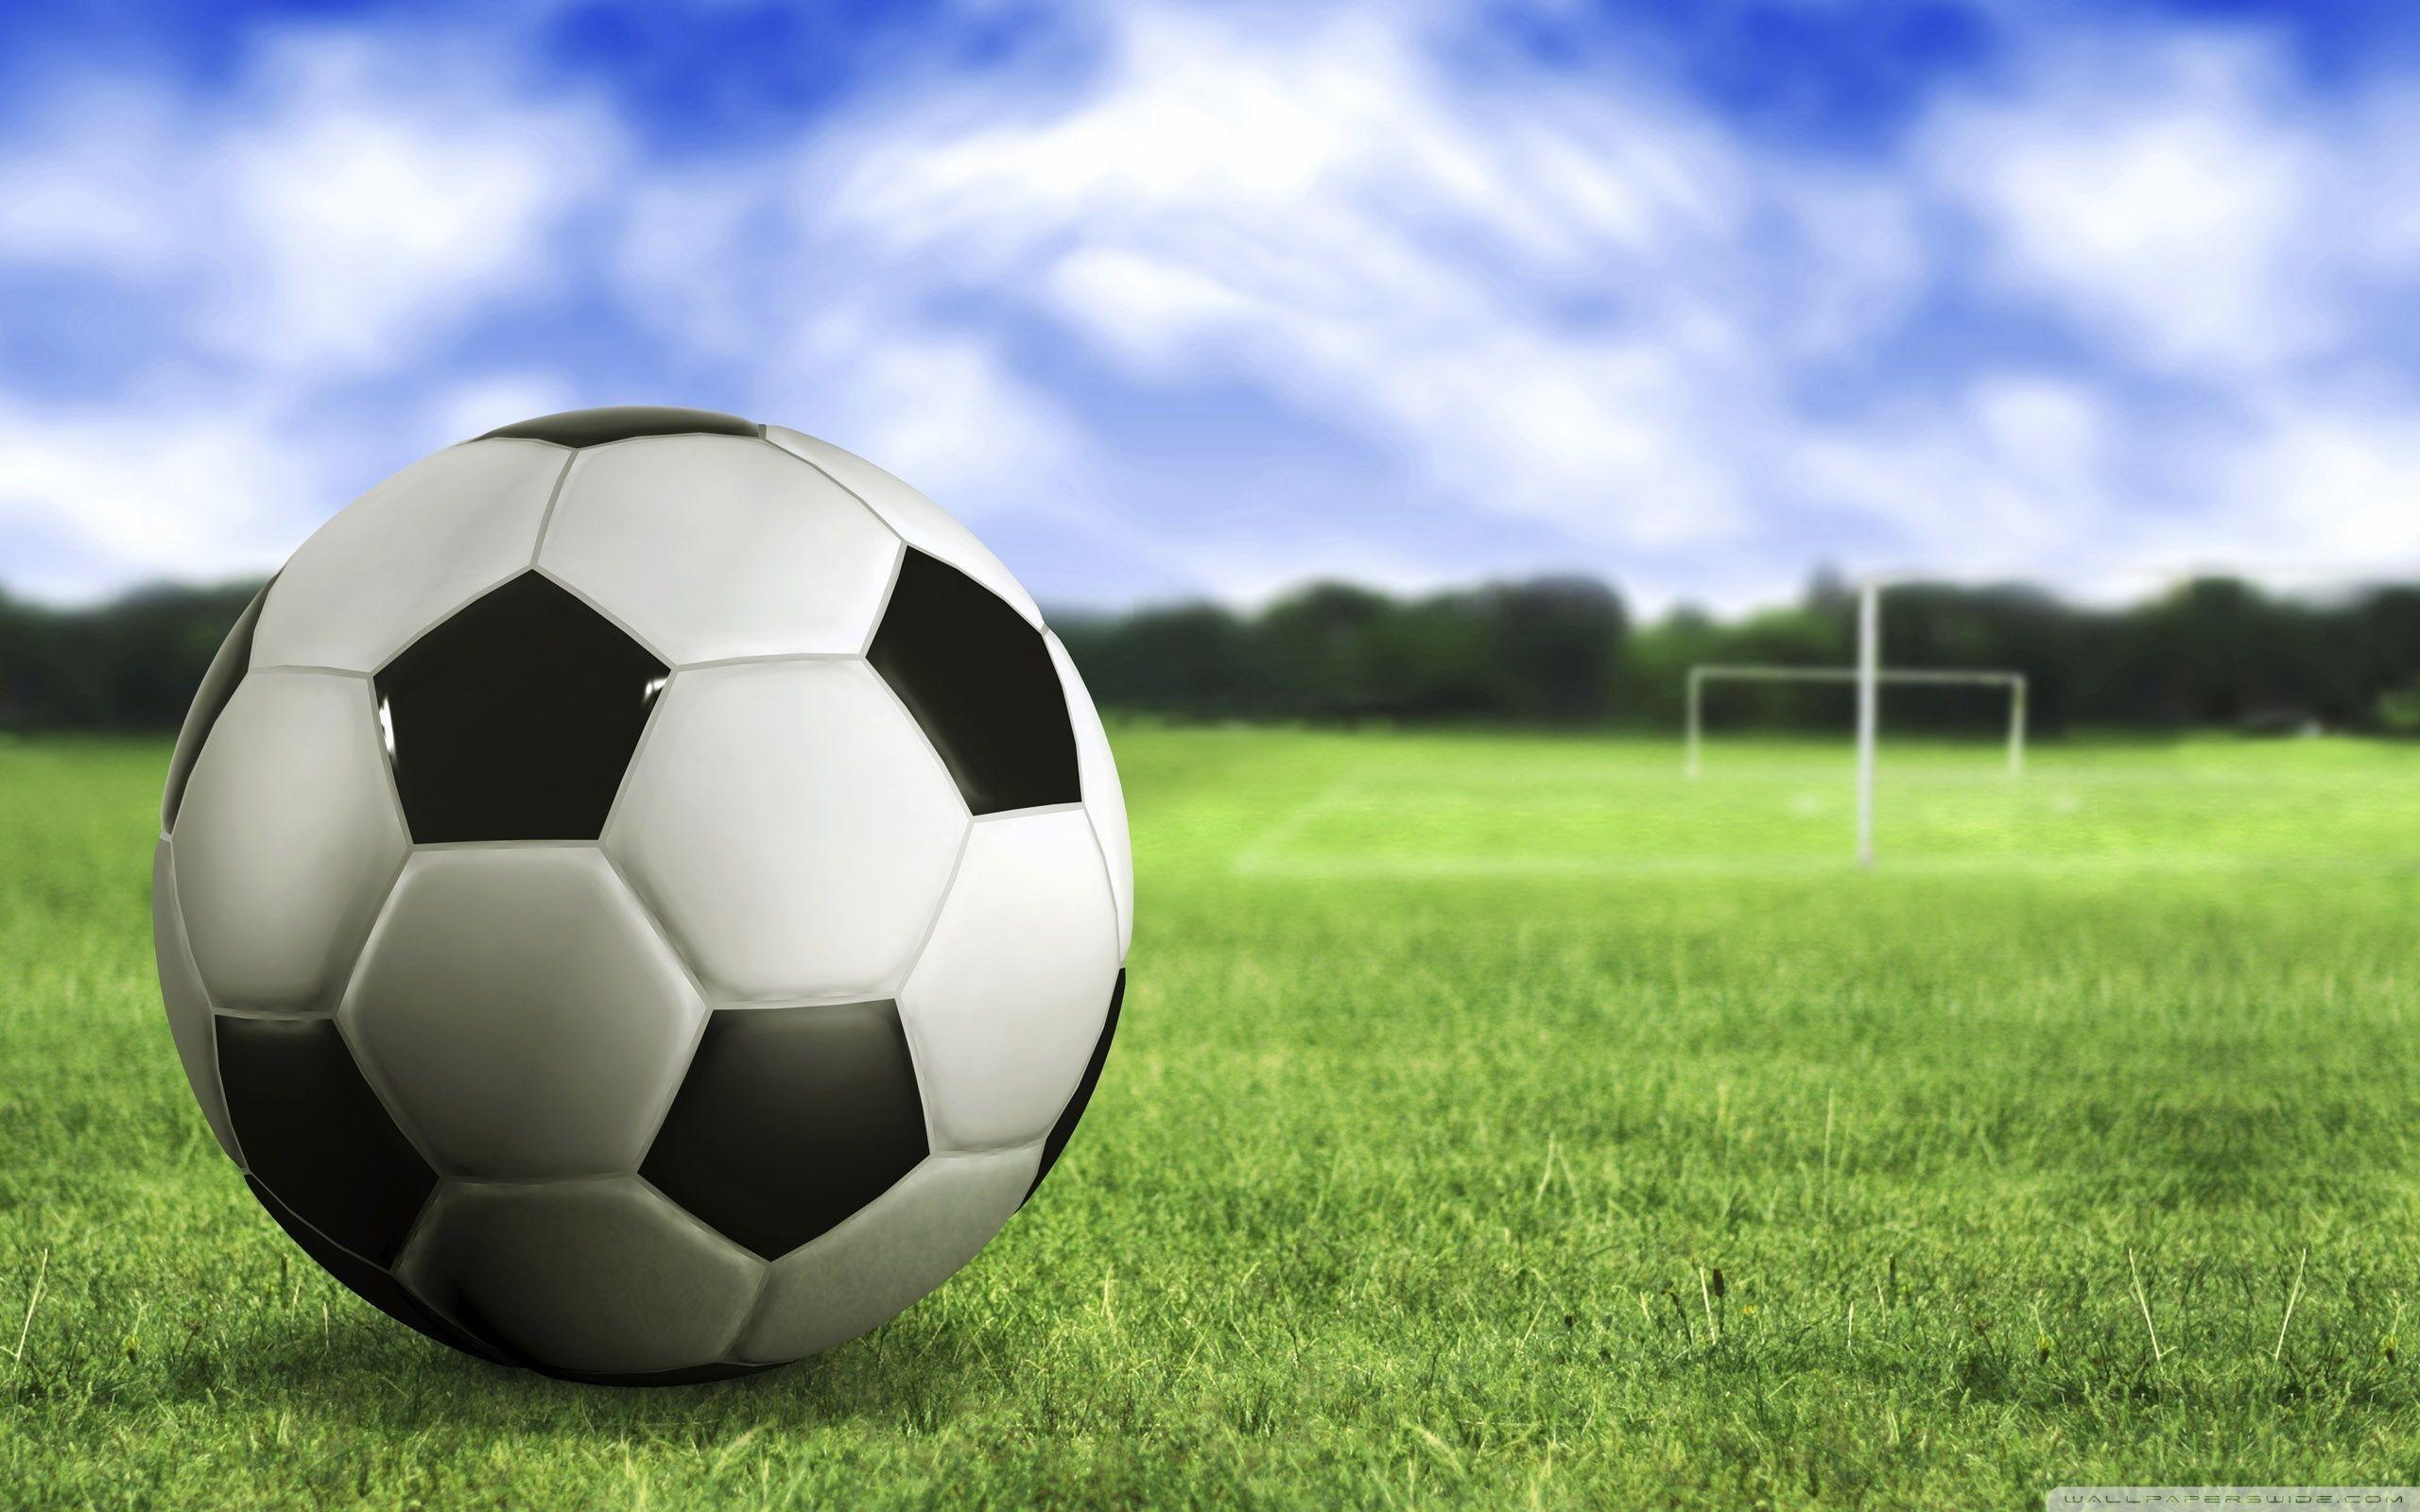 Green grass, Blue sky, Soccer ball, Soccer field wallpapers and .